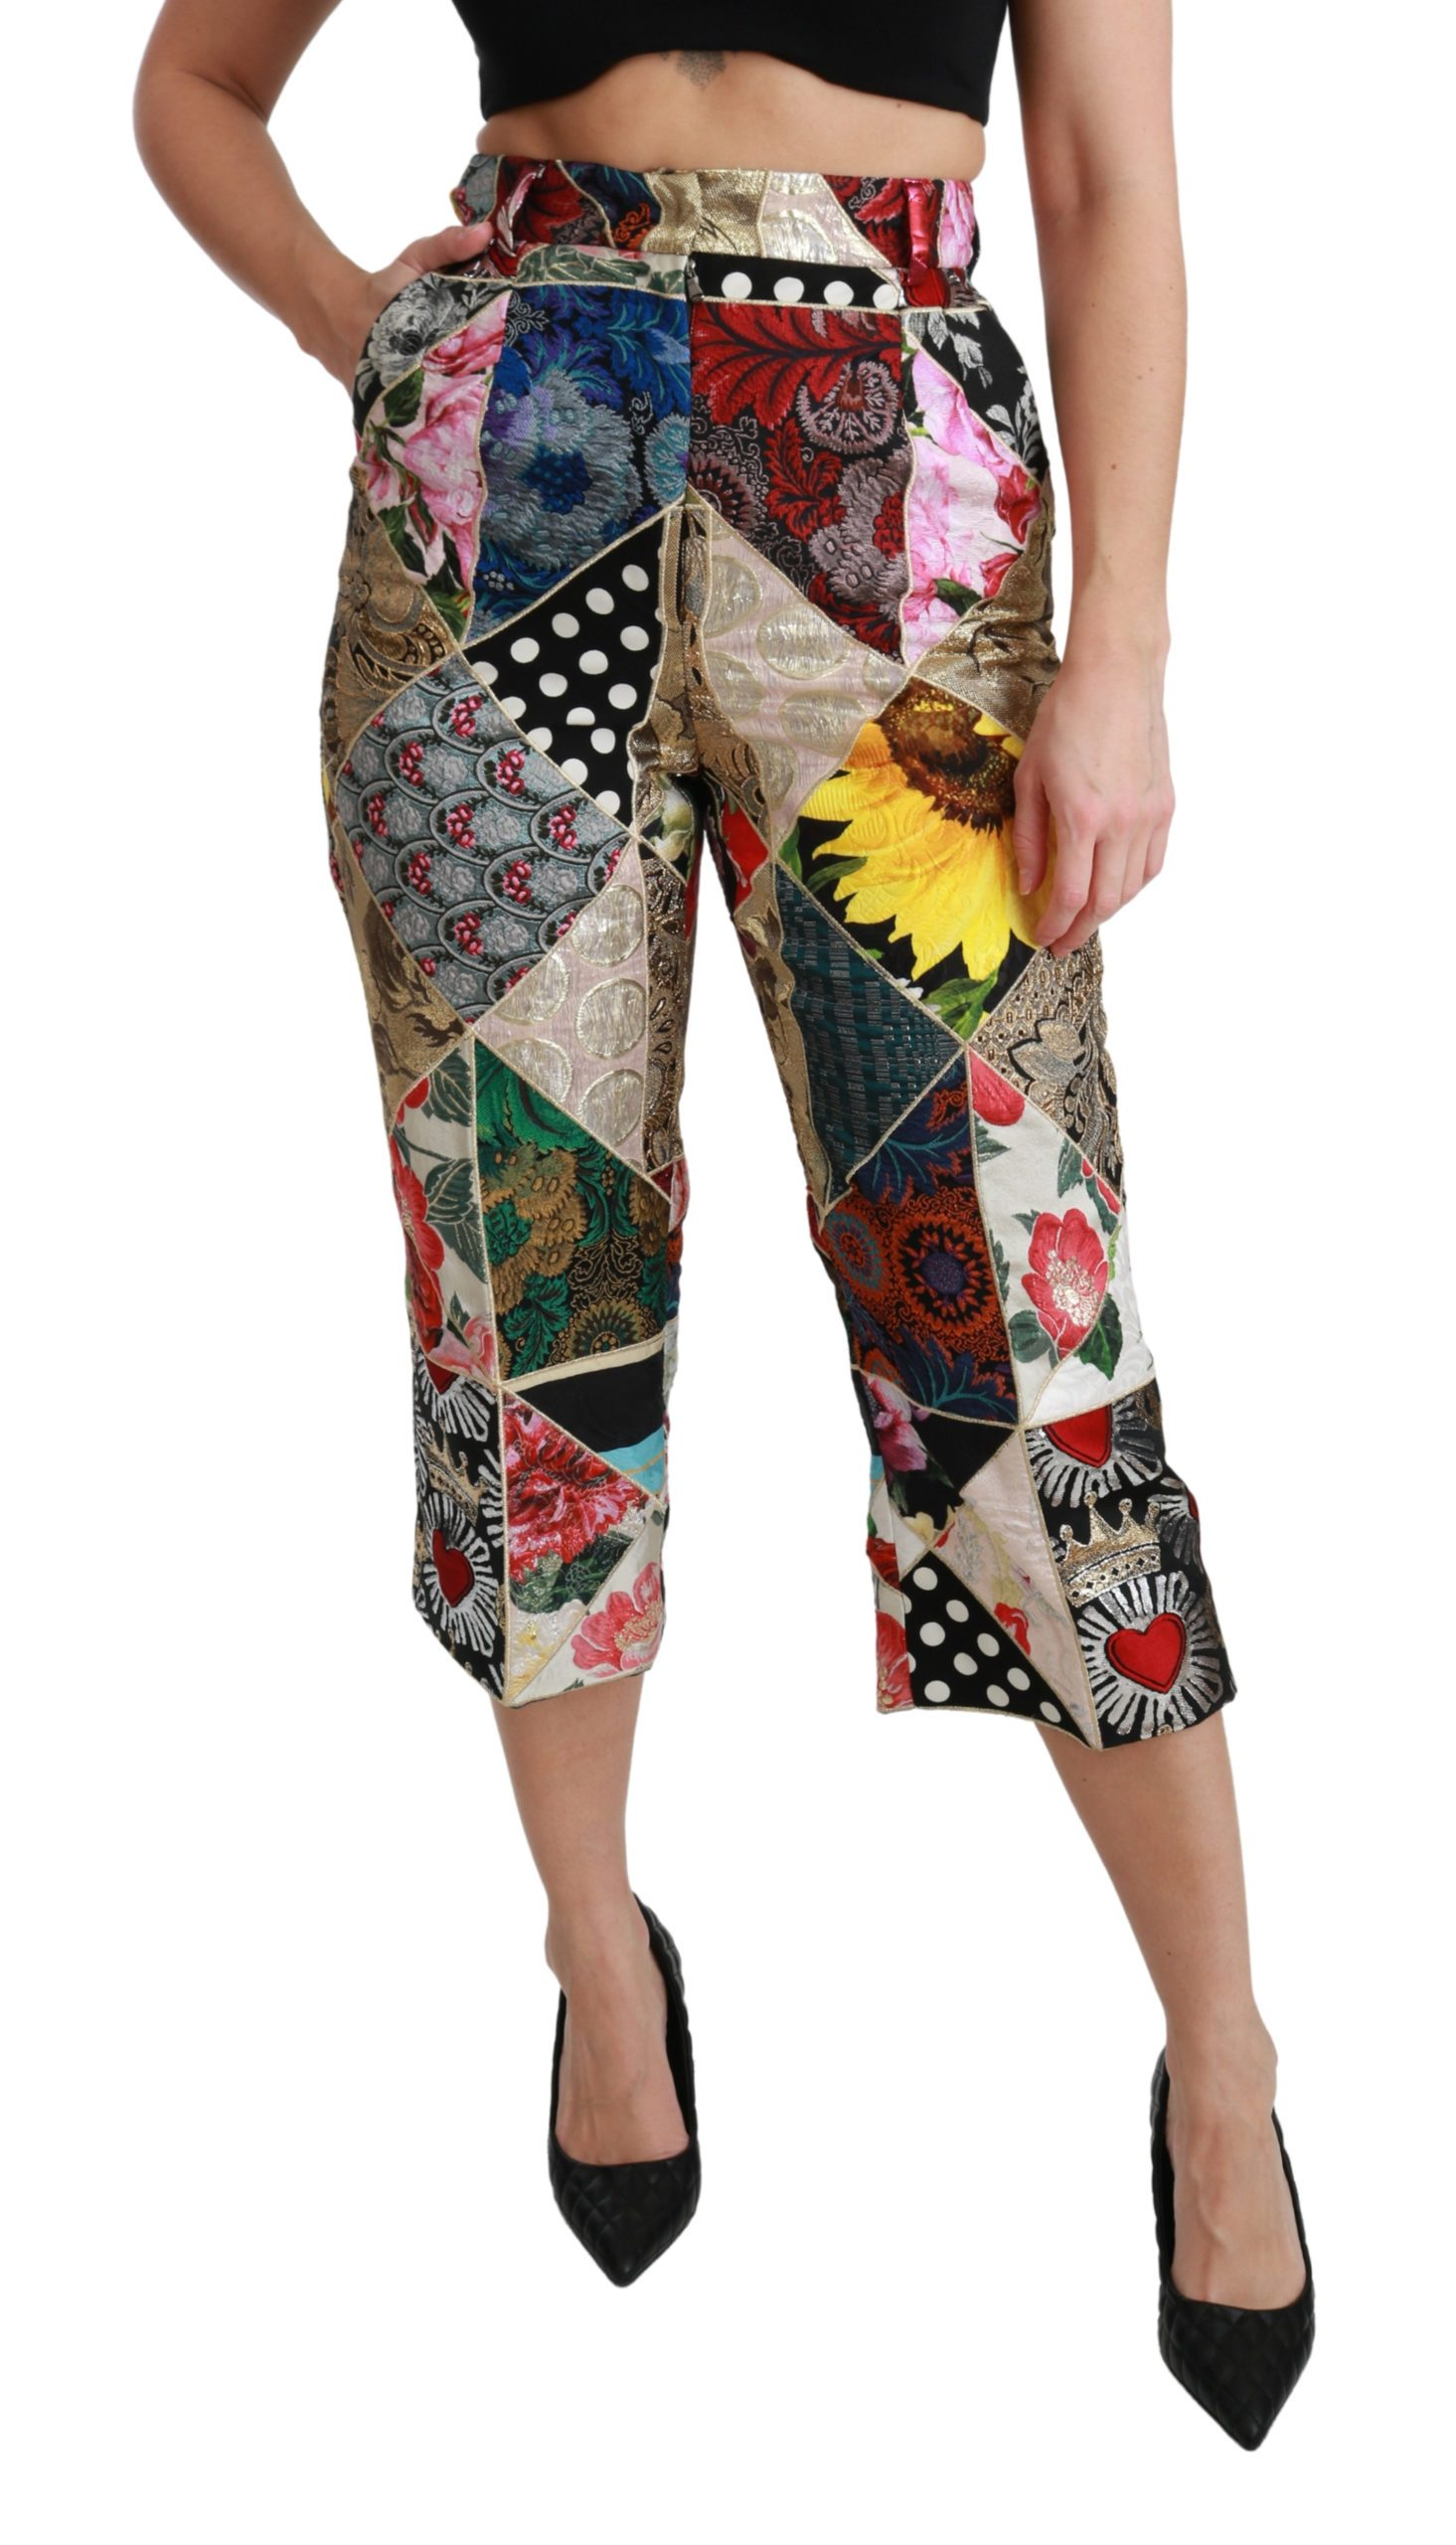 Dolce & Gabbana Women's Print High Waist Cropped Trouser Multicolor PAN70937 - IT40|S